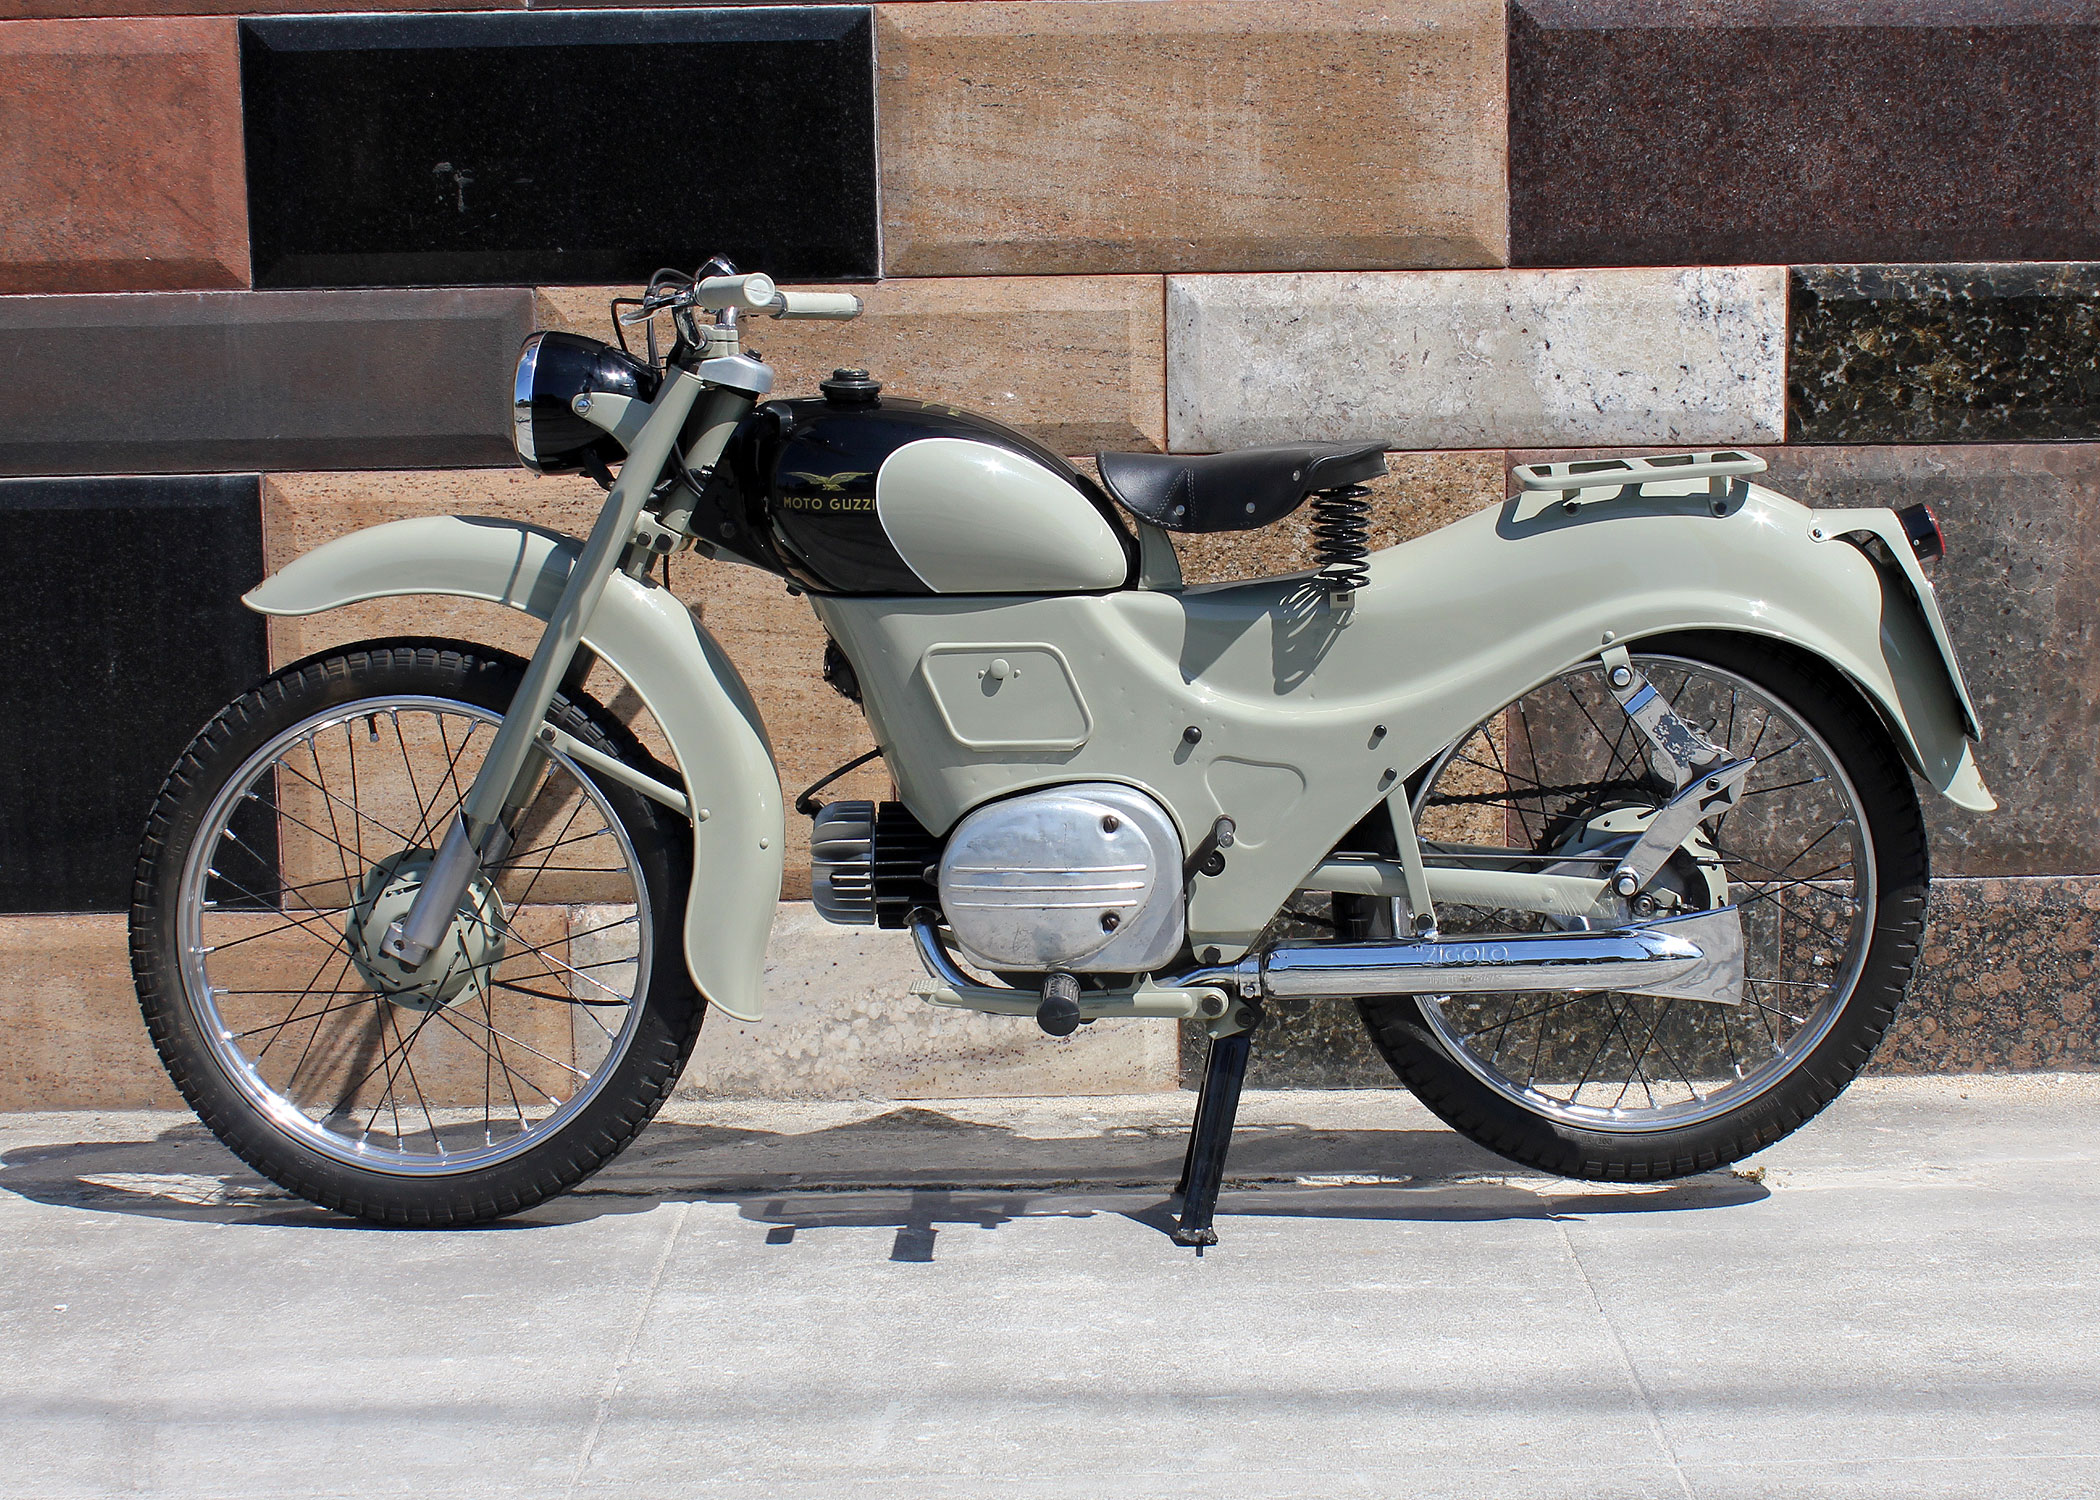 D198_MotoGuzzi_Zigolo_8.jpg